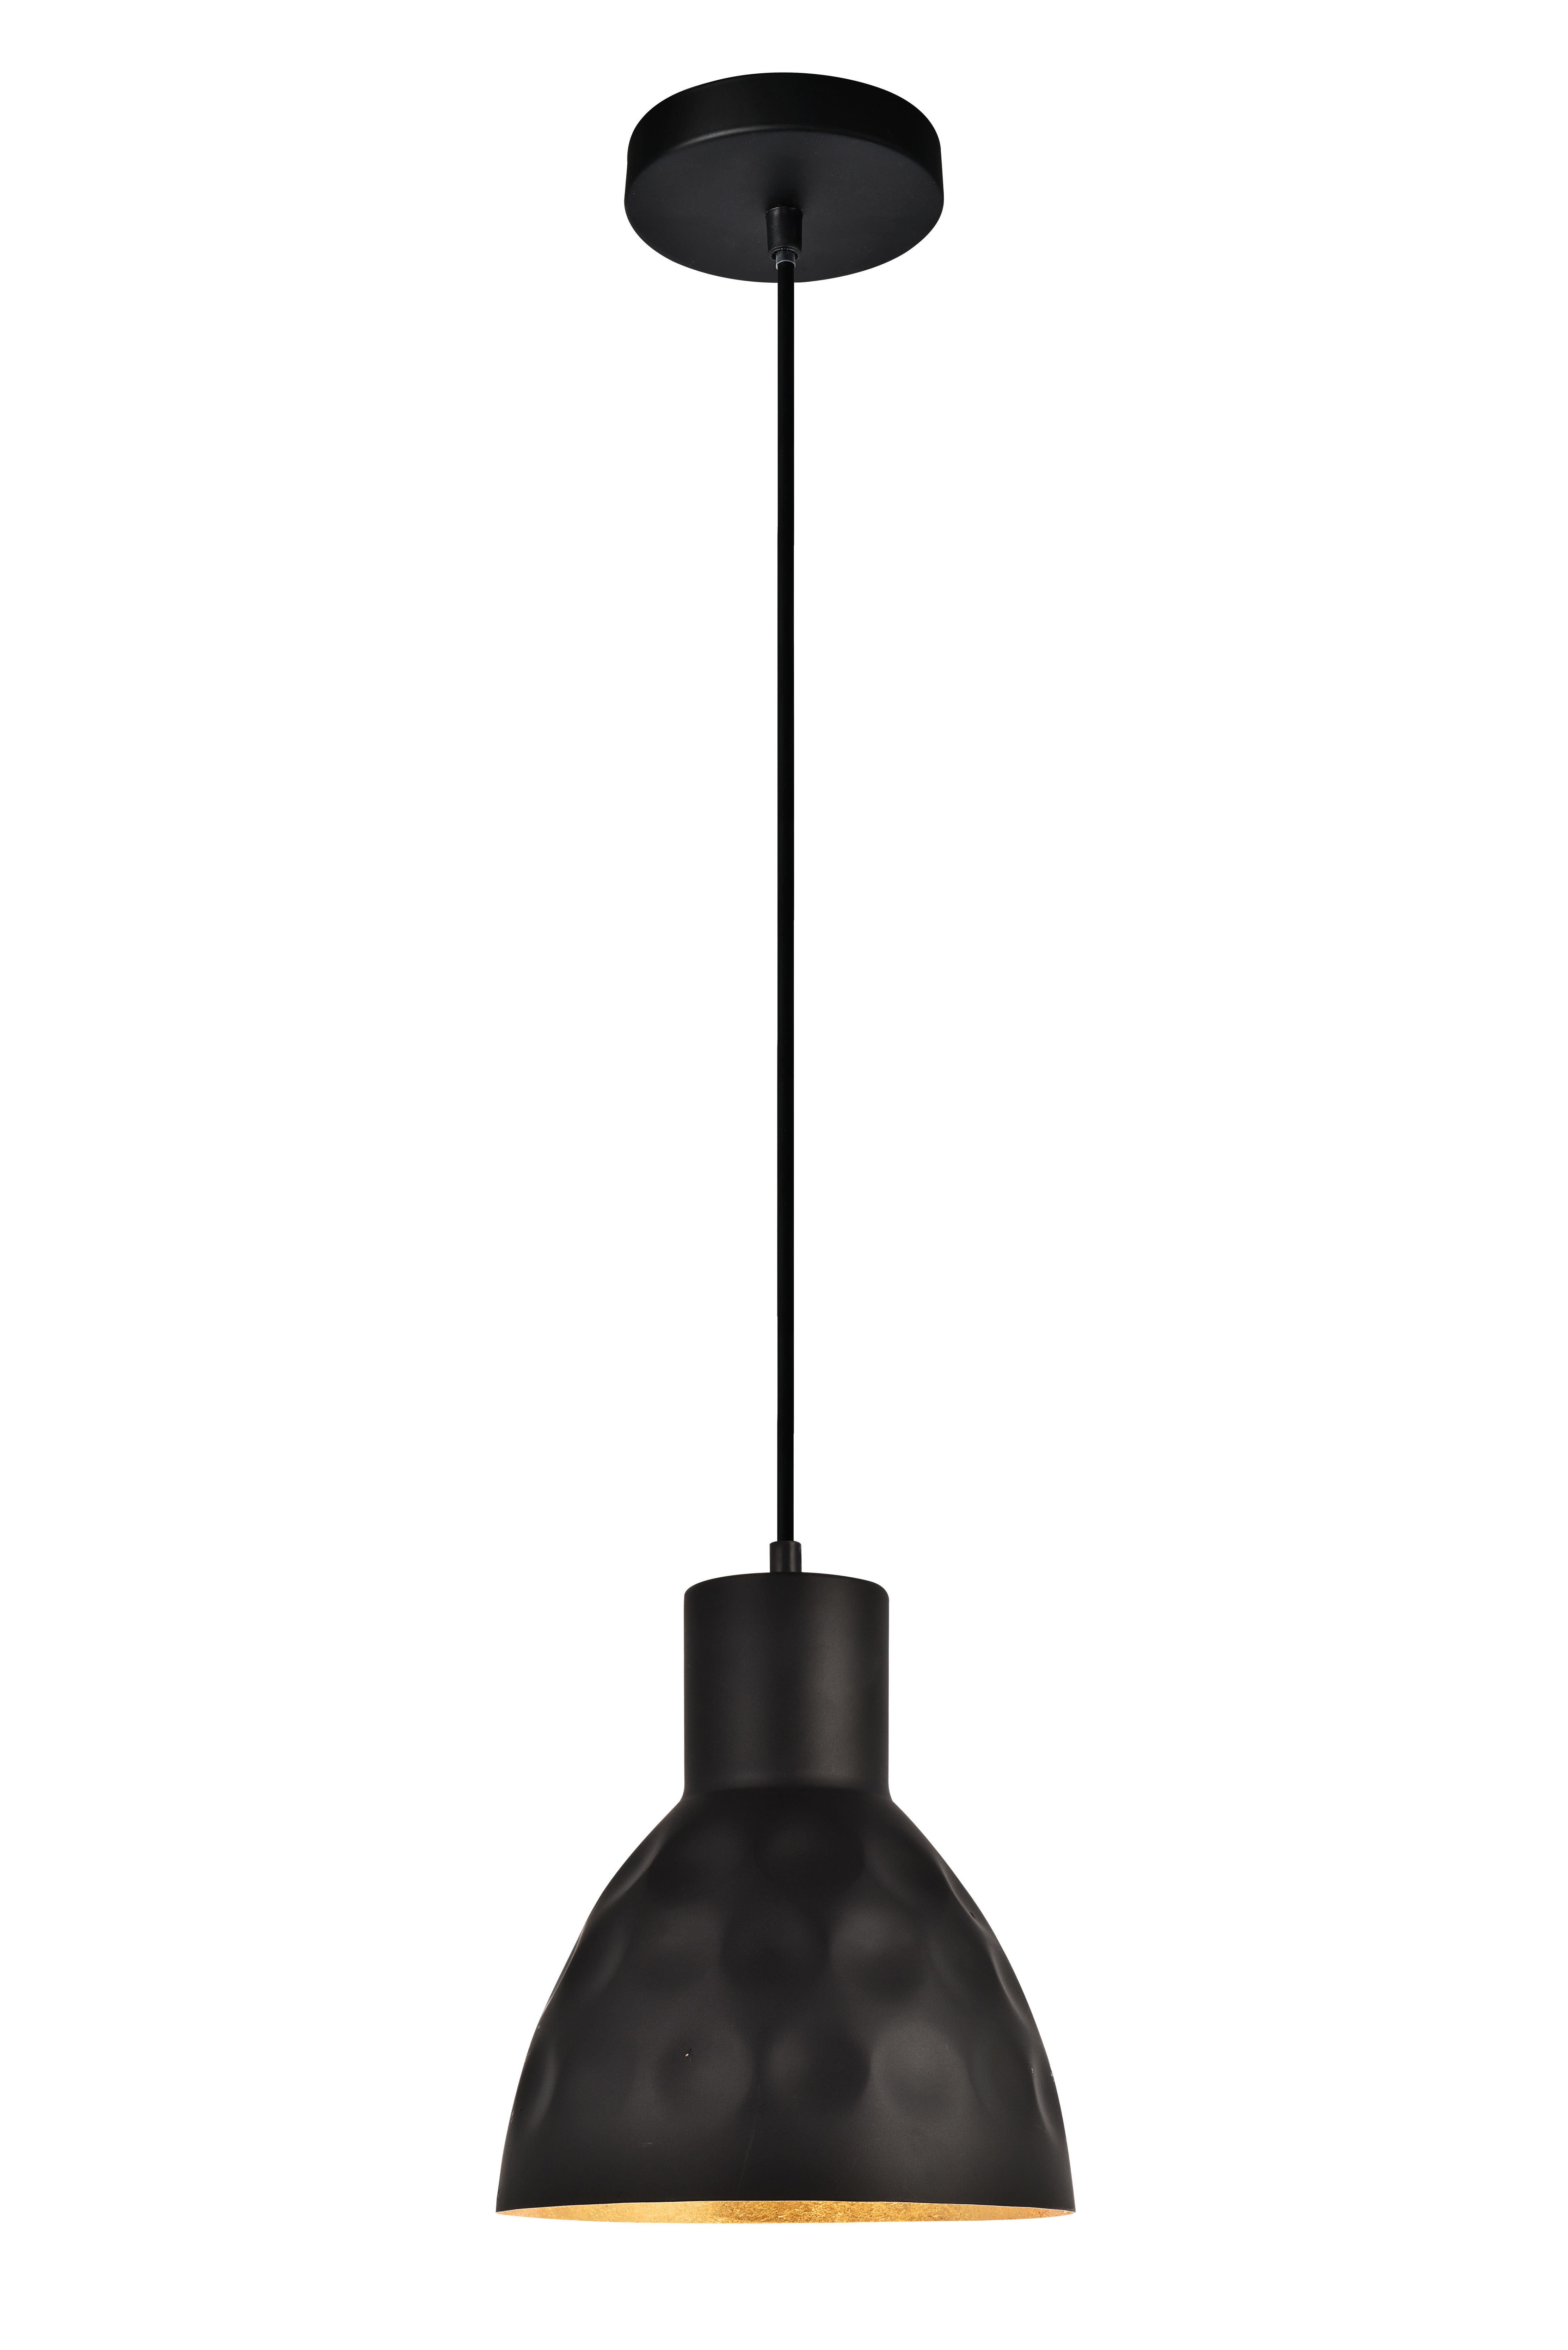 Reinhold 1 Light Bell Pendant Pertaining To Yarger 1 Light Single Bell Pendants (Gallery 18 of 30)